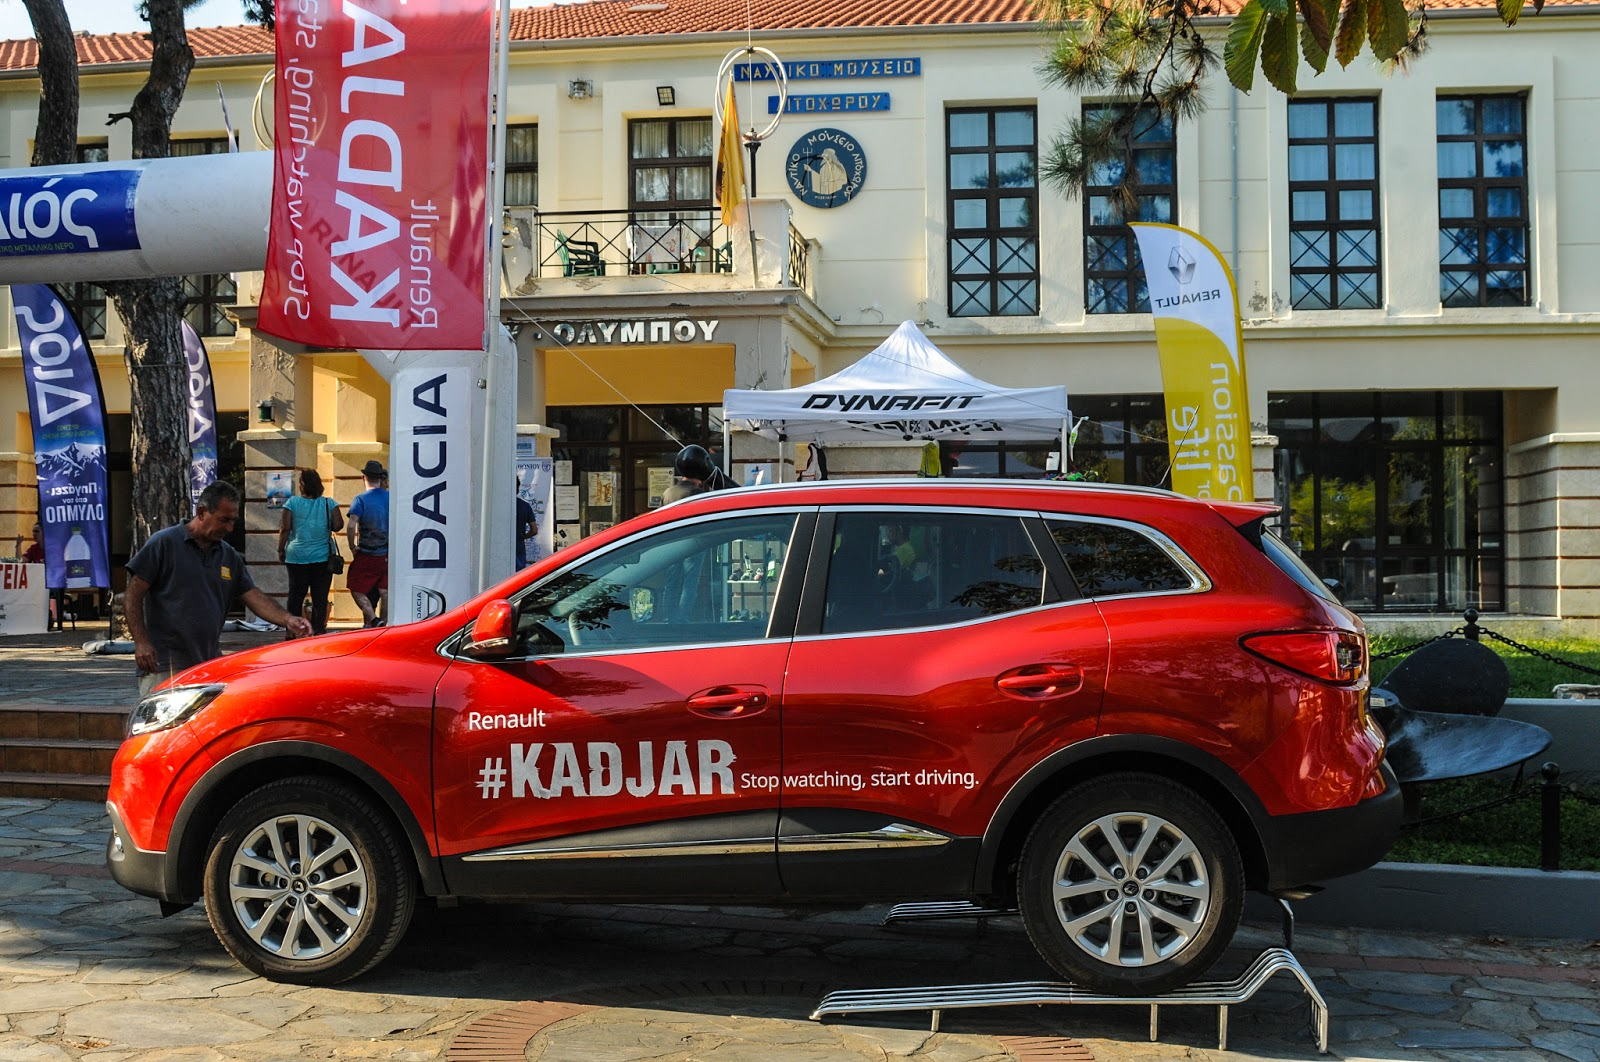 DSC 40400015 Το Renault Kadjar στον 30ο Ορειβατικό Μαραθώνιο Ολύμπου